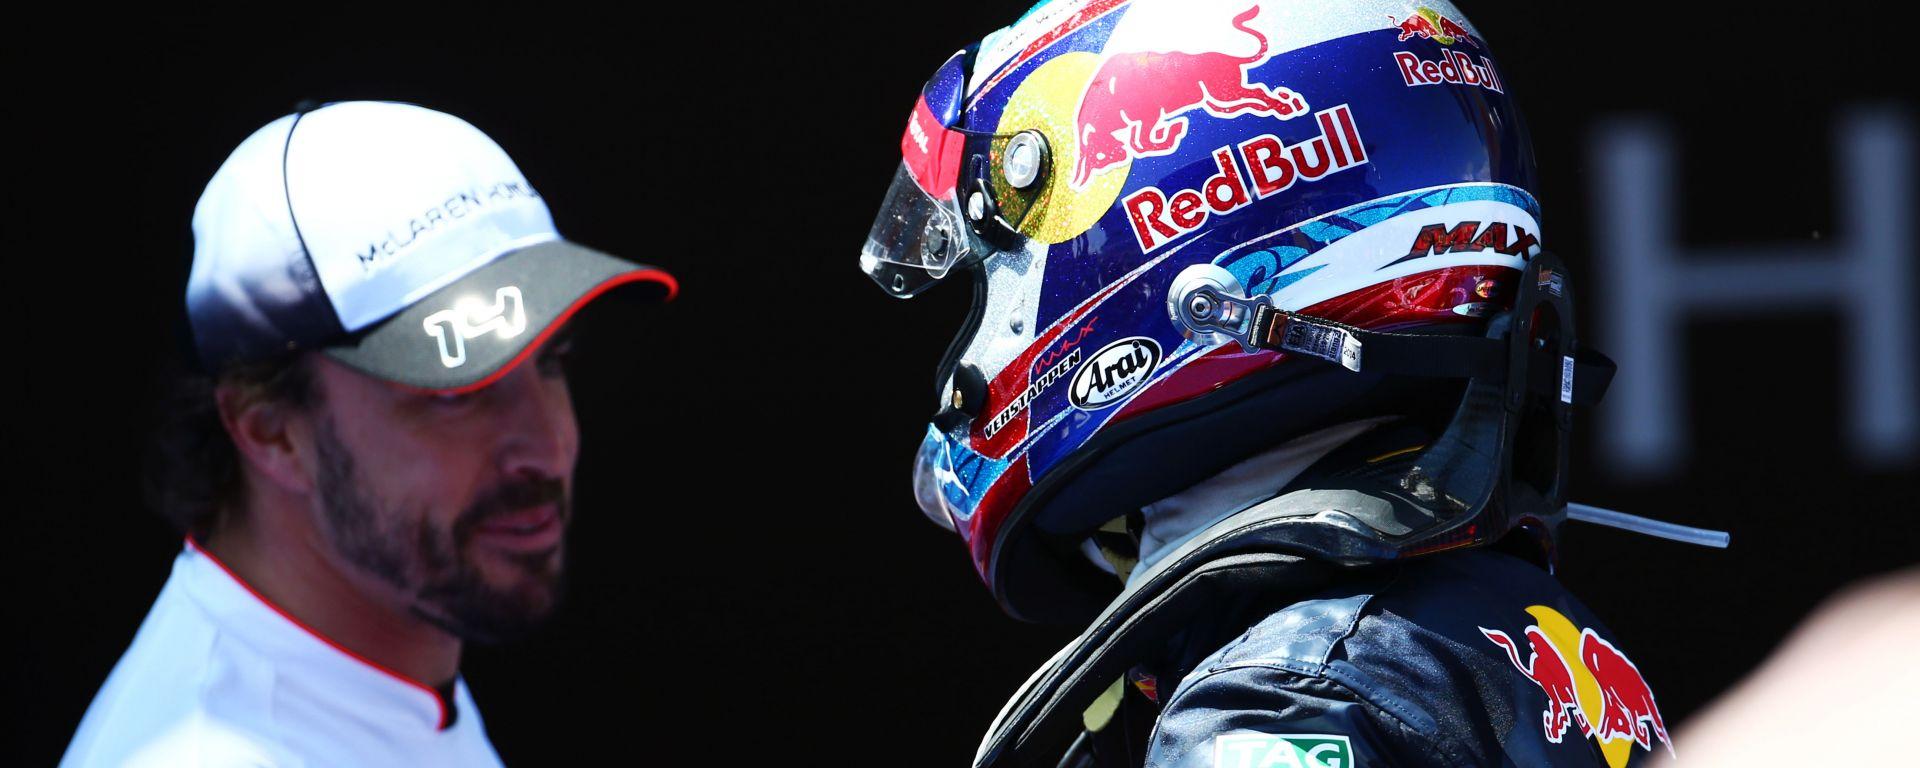 F1 2016: Fernando Alonso e Max Verstappen